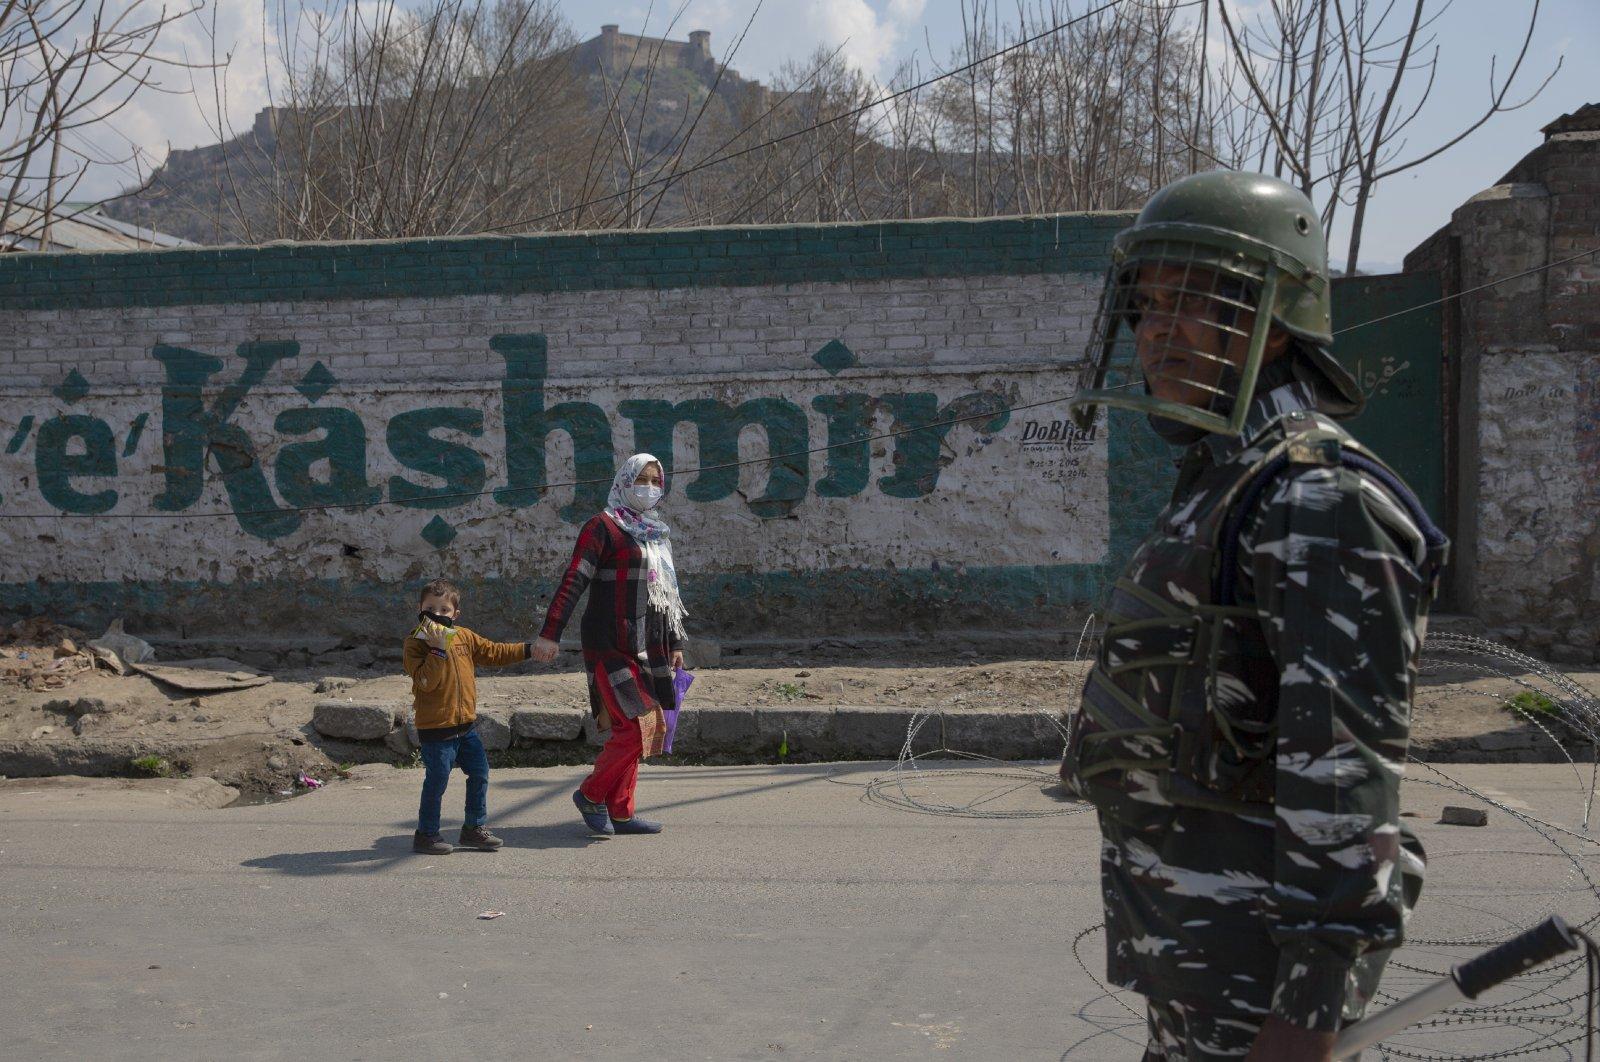 A Kashmiri woman along with her child walks past an Indian paramilitary soldier, Srinagar, Thursday, March 19, 2020. (AP Photo)